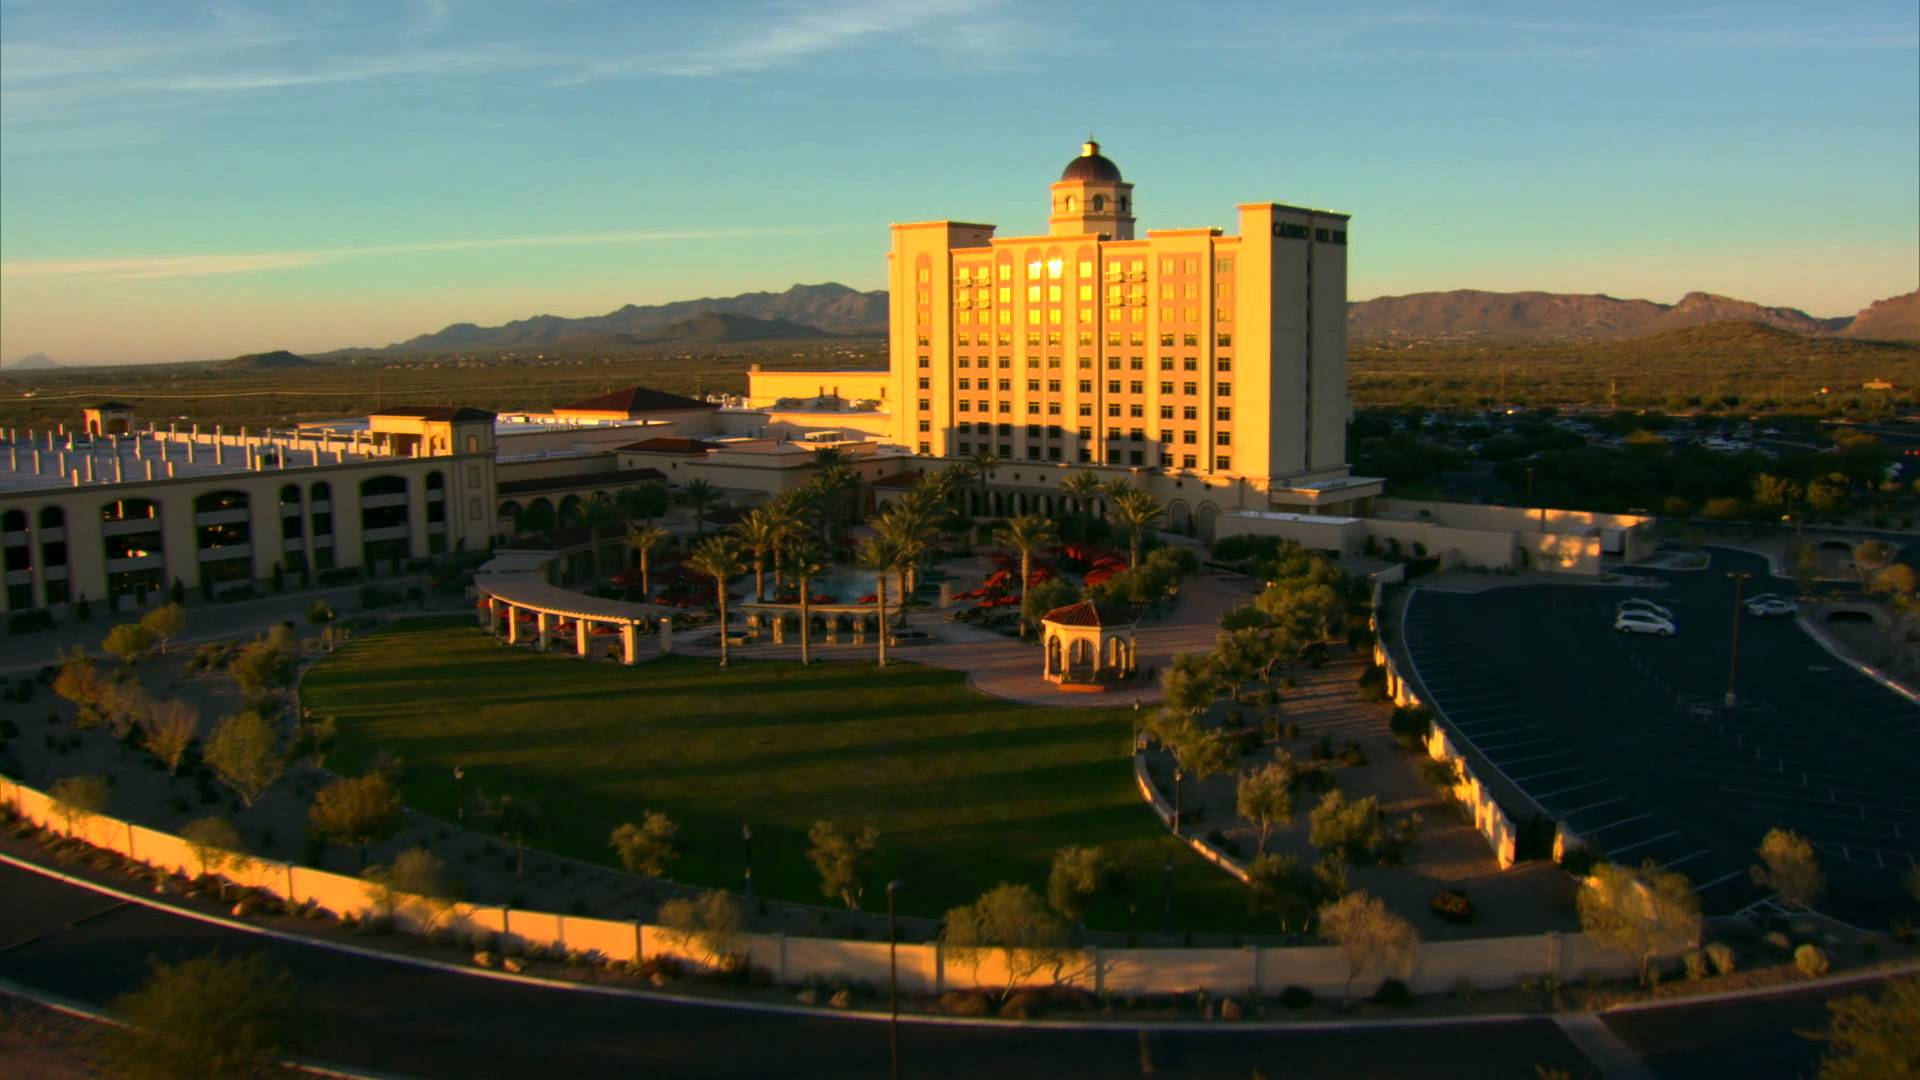 CASINO DEL SOL RESORT & CASINO    TUCSON, AZ